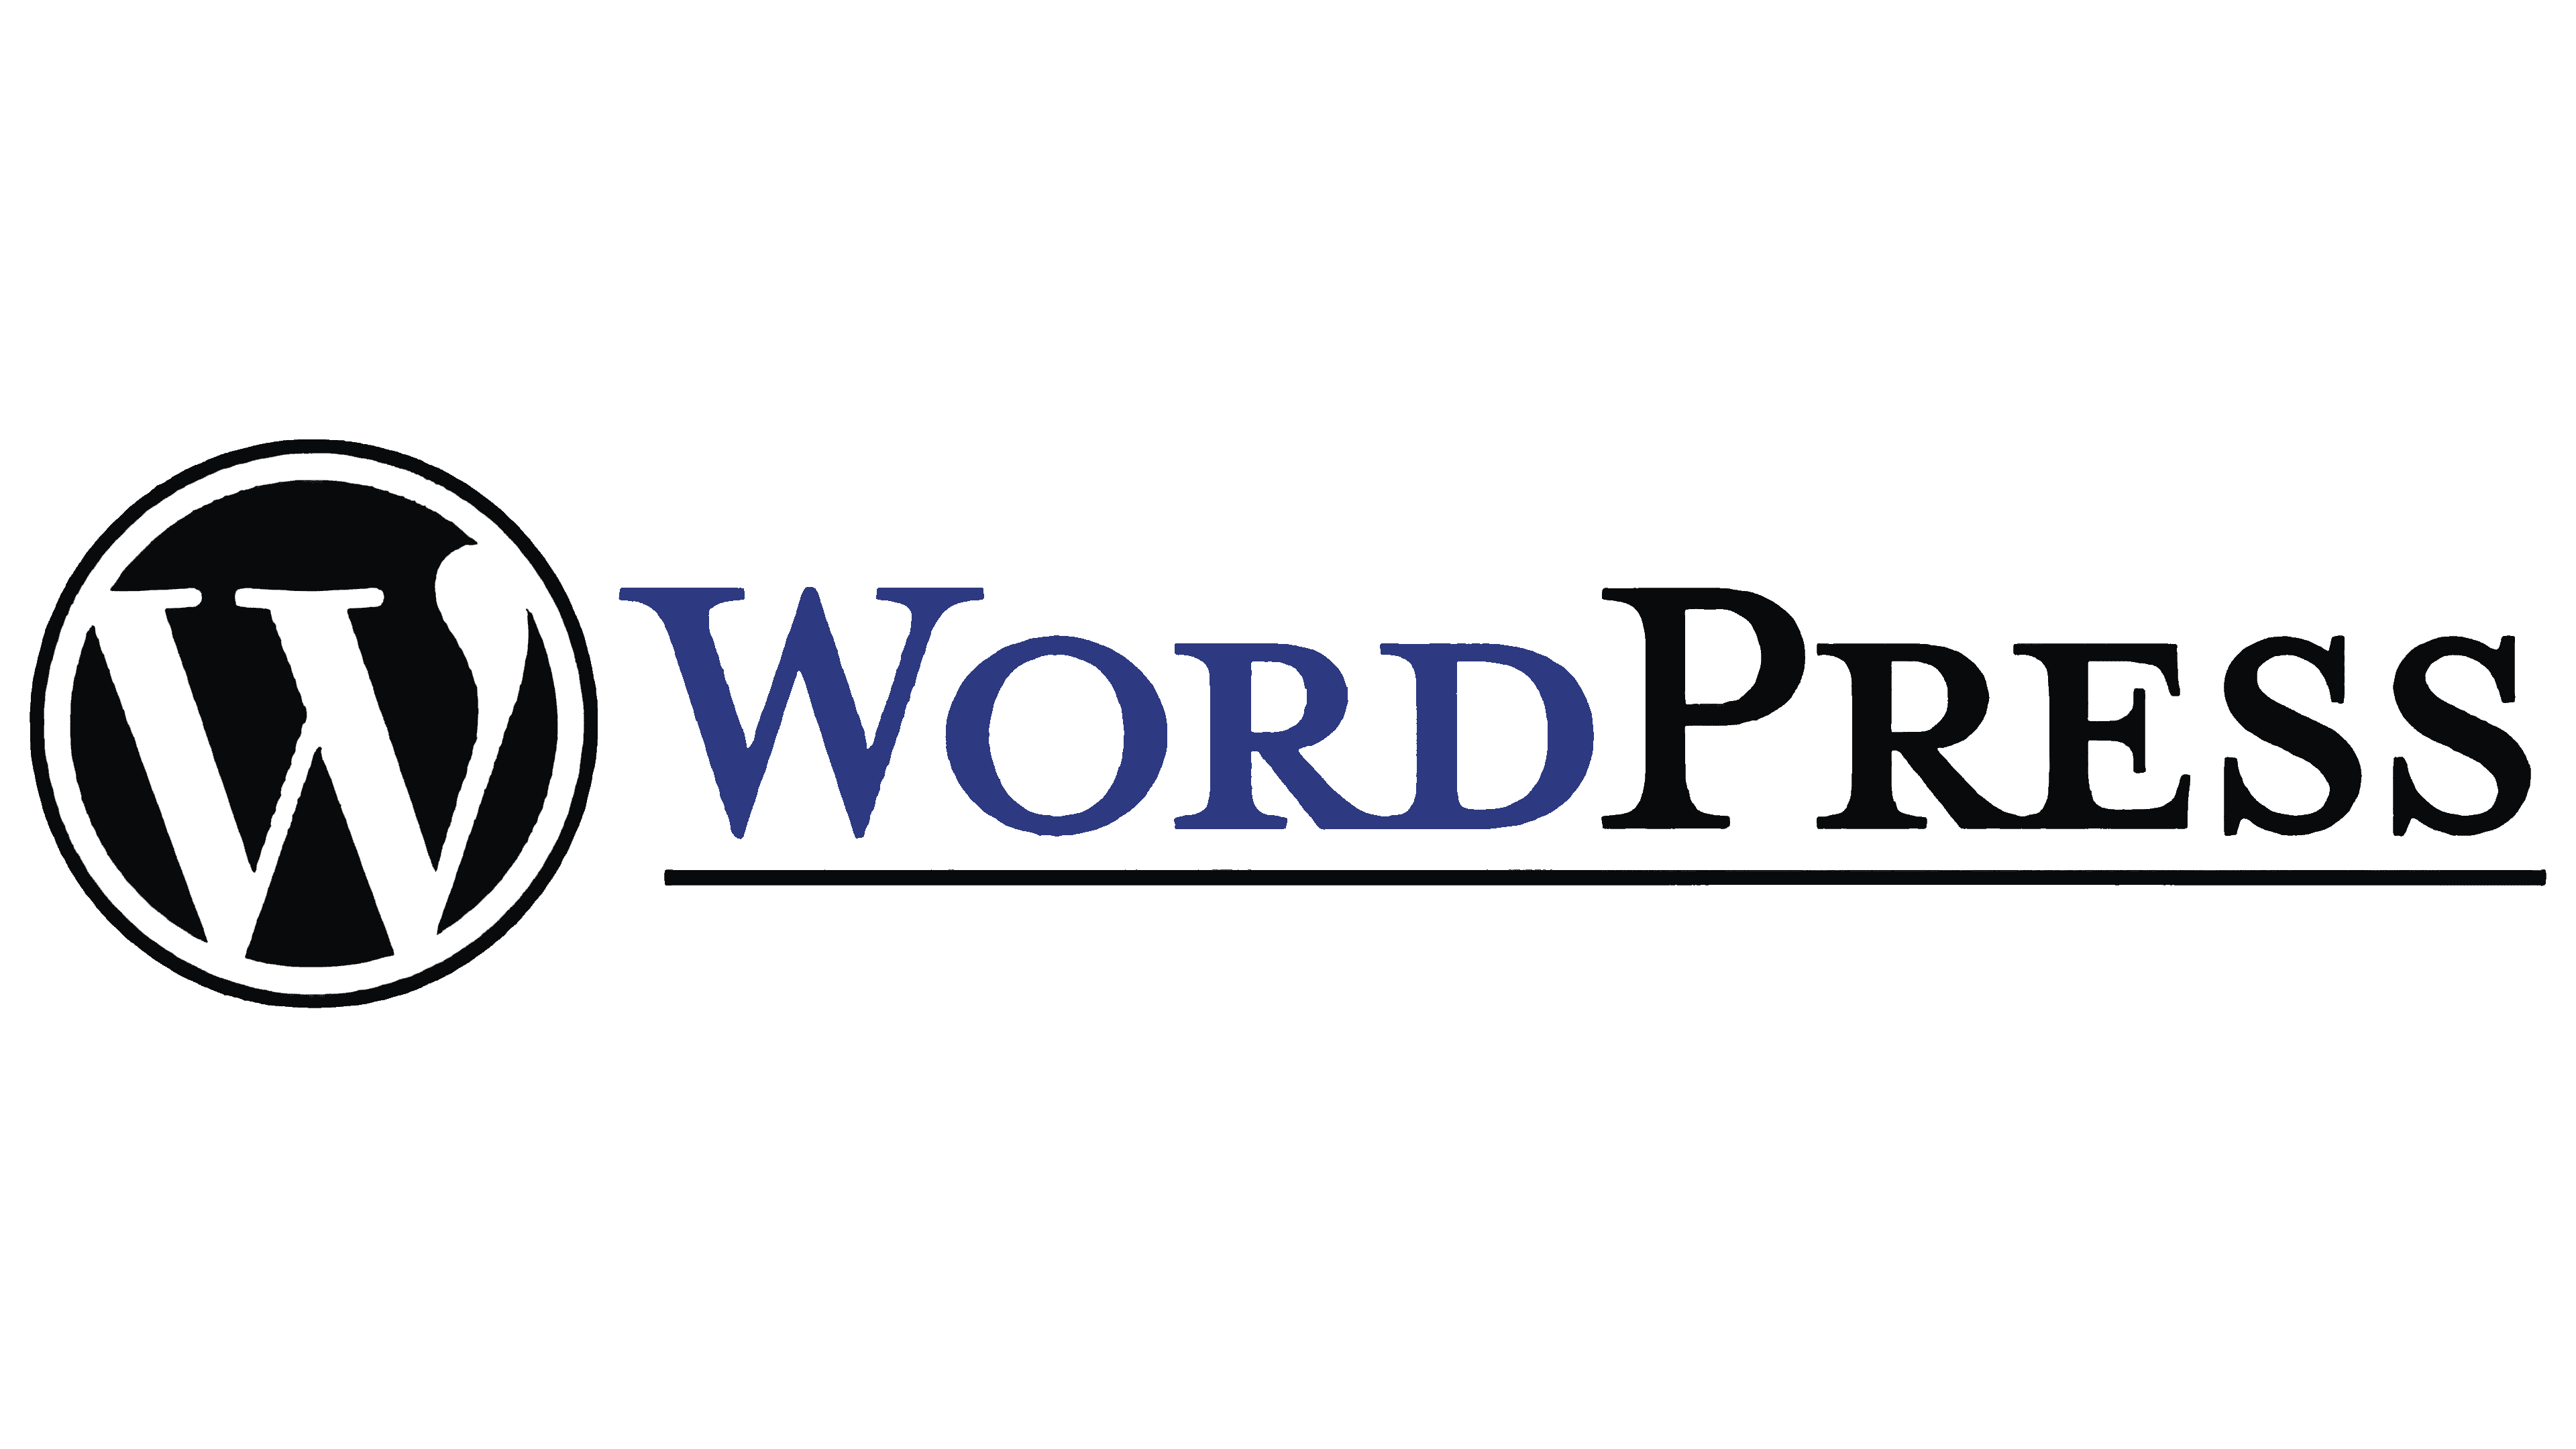 https://www.raindance.net.au/wp-content/uploads/2021/05/WordPress-Logo-2003-2008.png